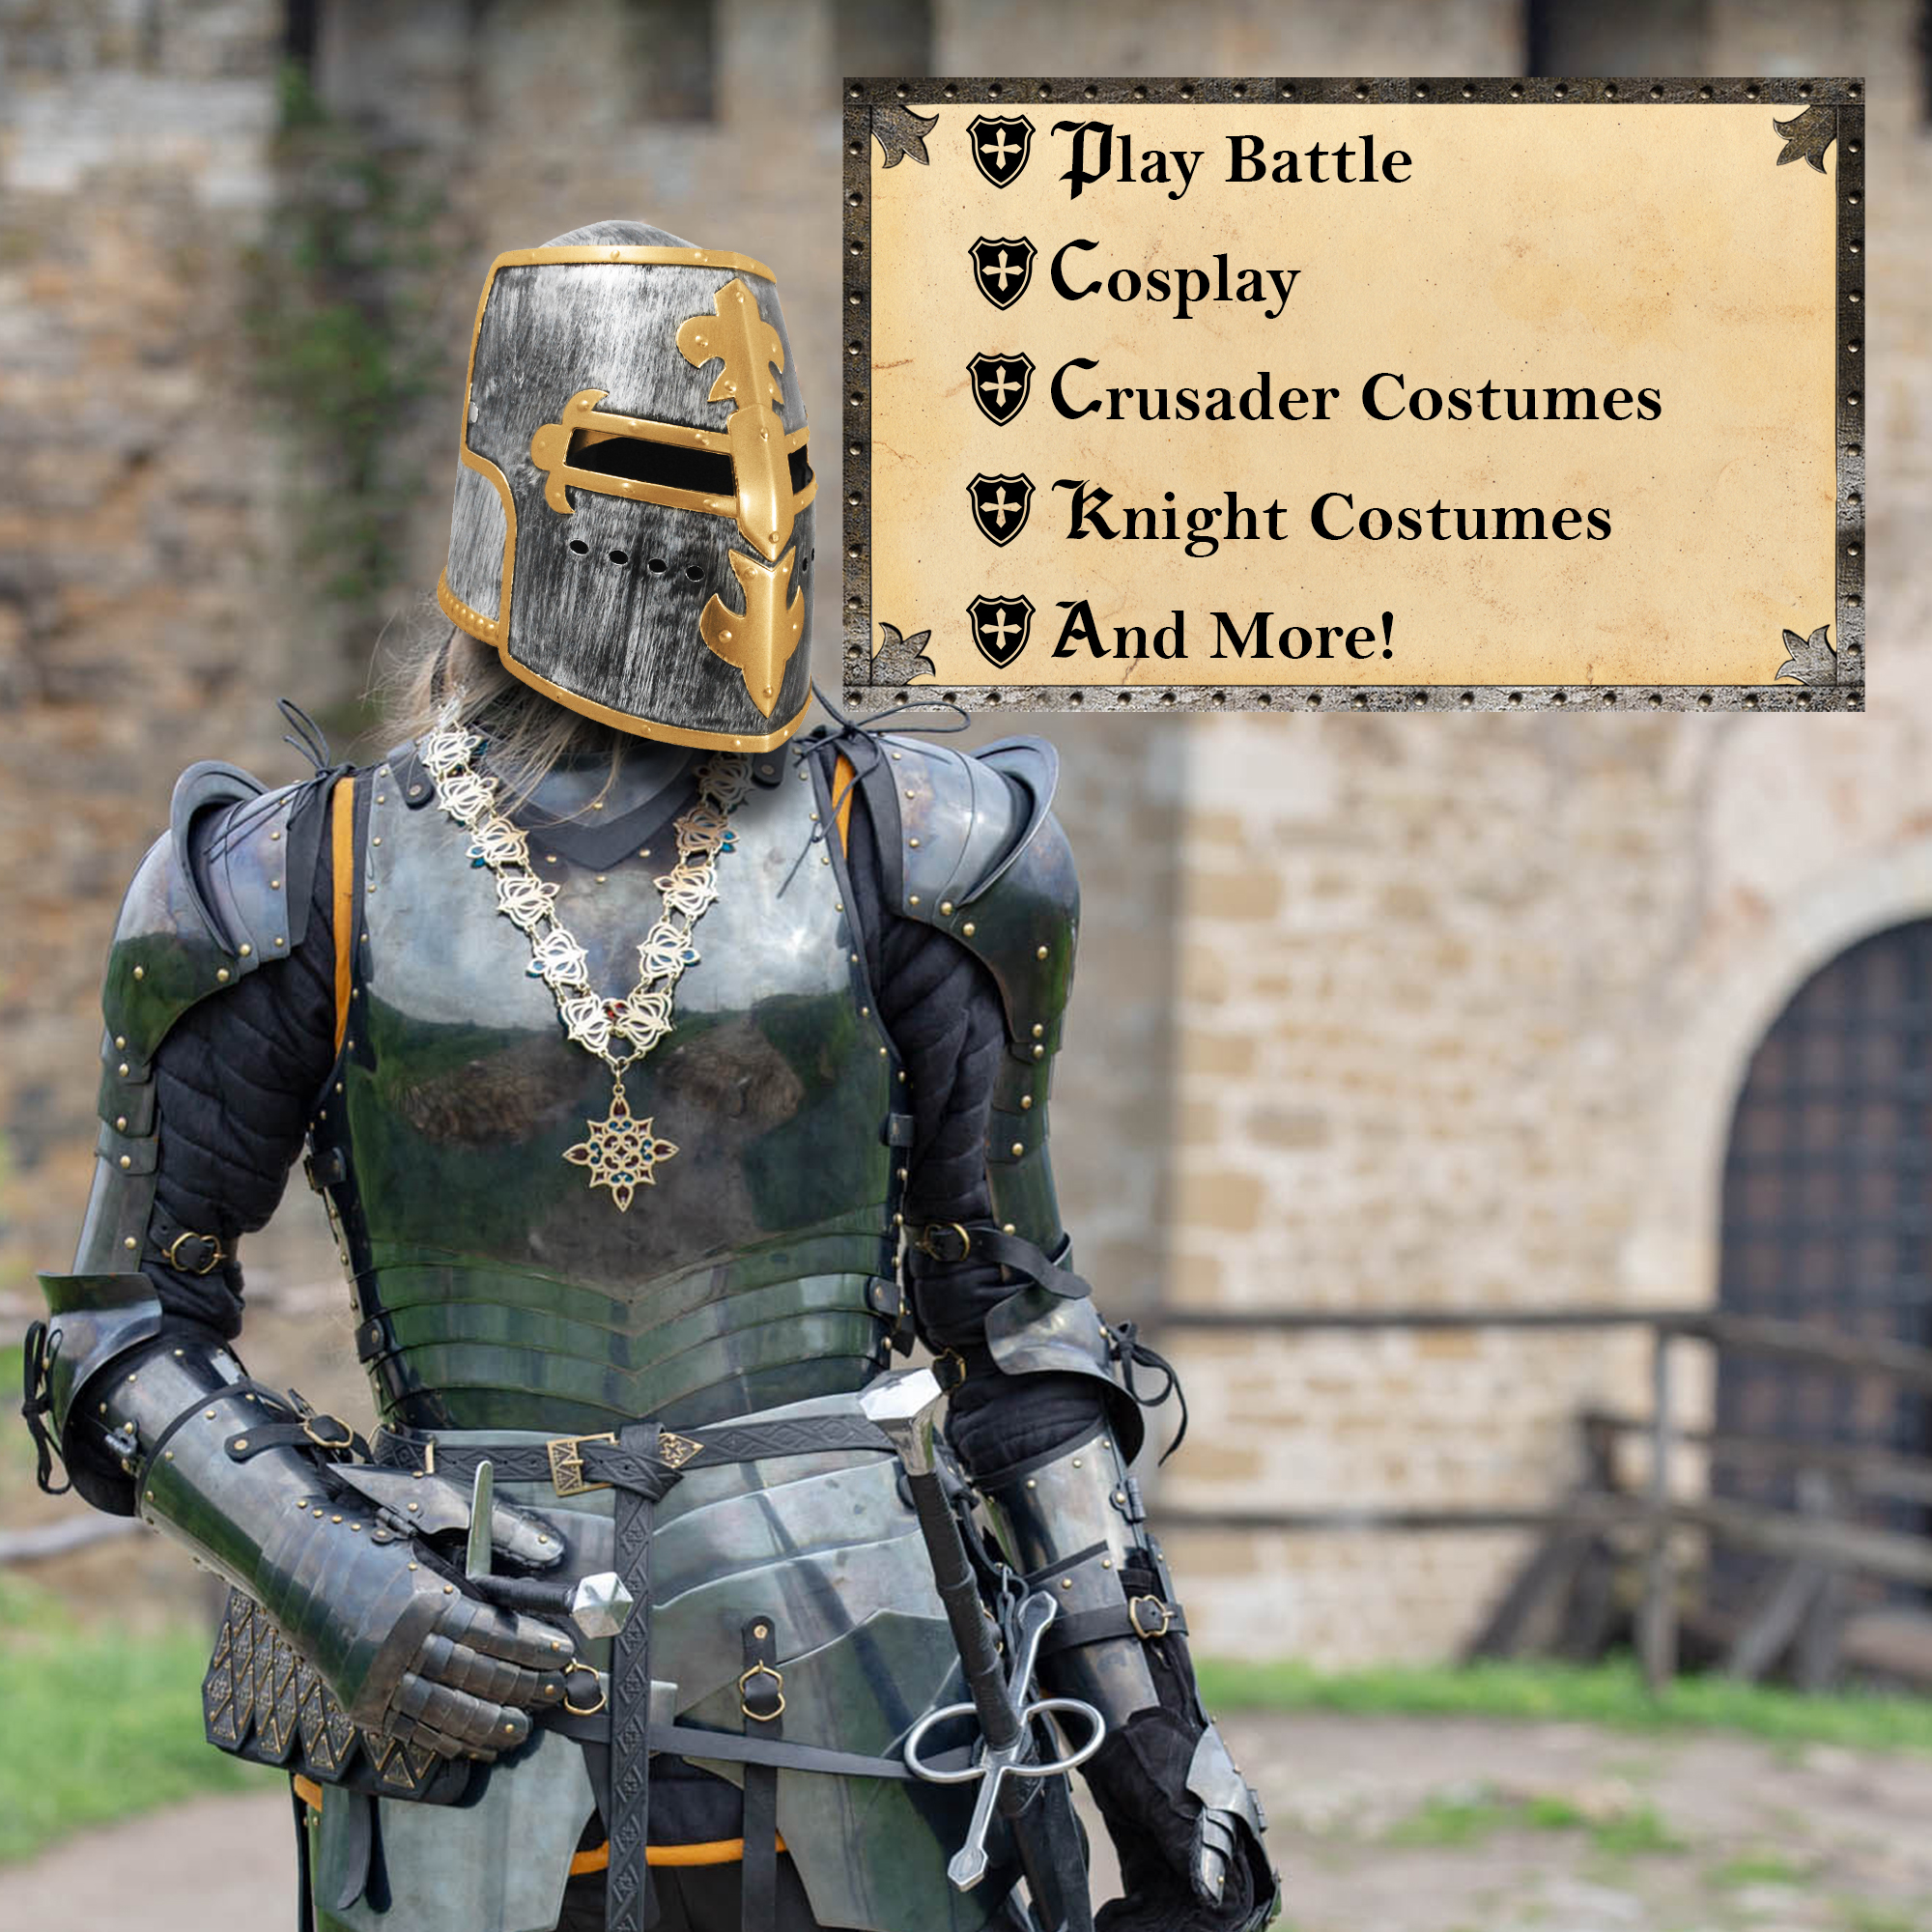 thumbnail 8 - Silver Pewter Knight Roman Armor Crusader Helmet Mask Medieval Adult Costume